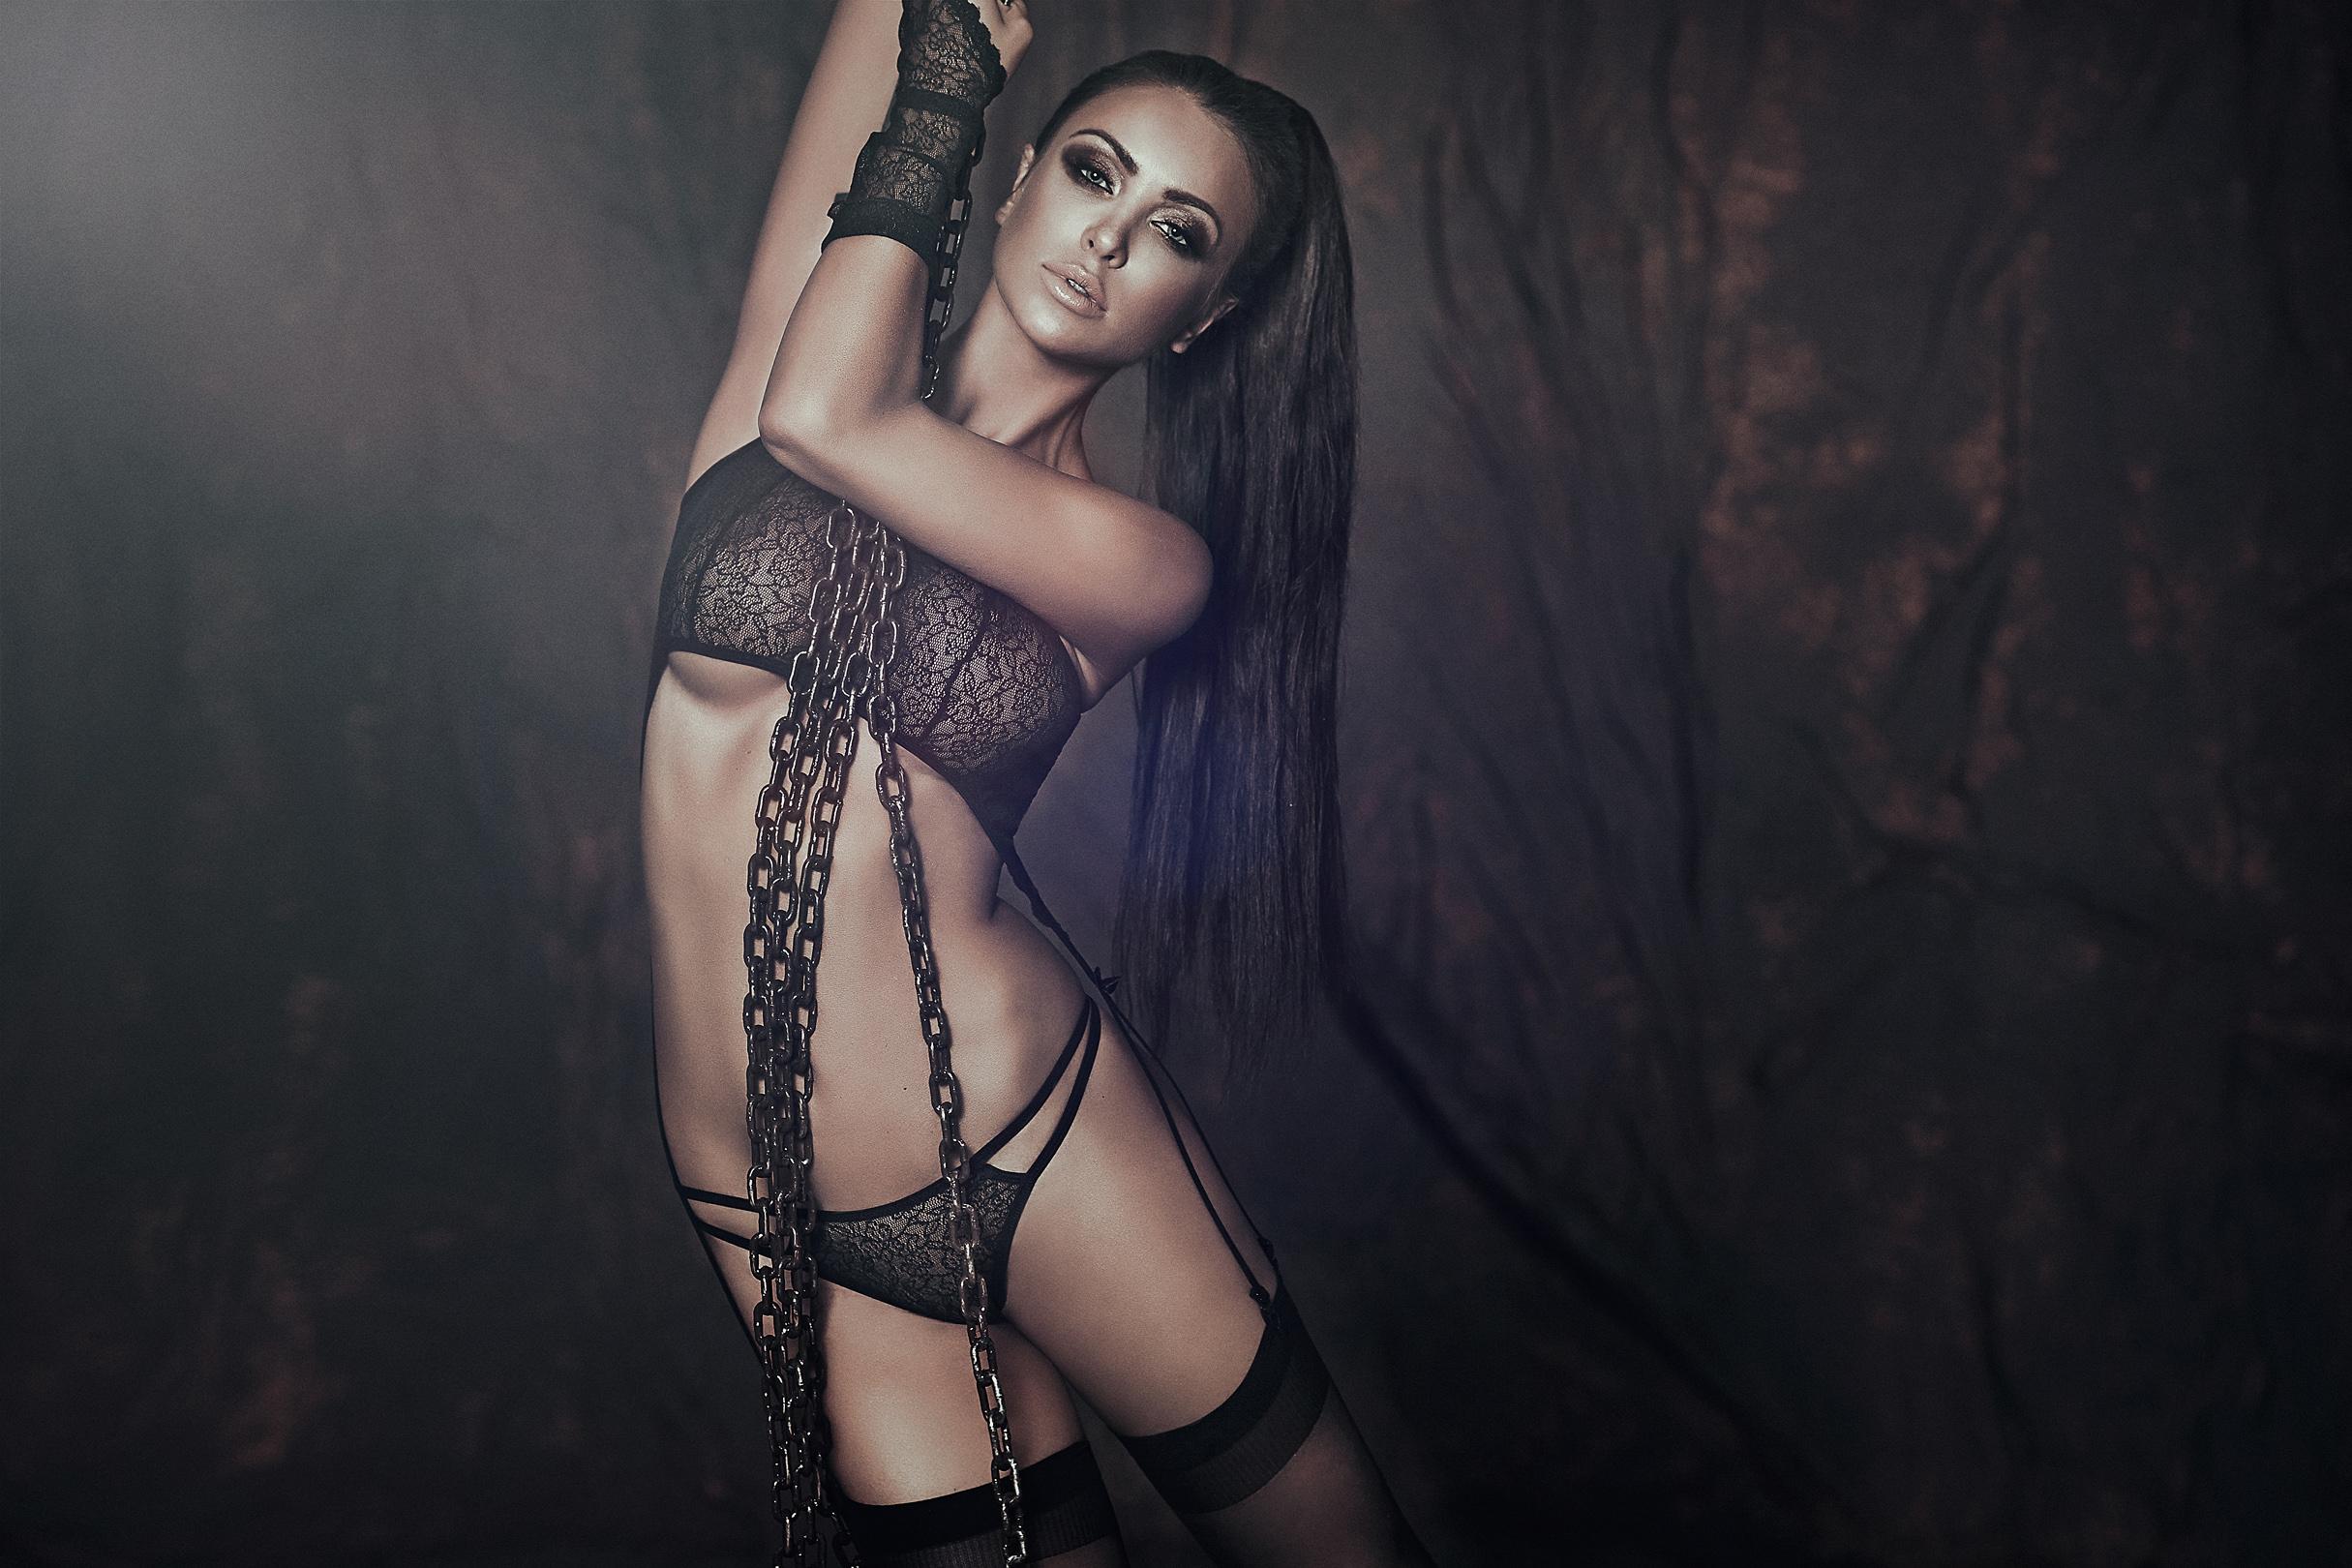 hot women wearing sexy lingerie